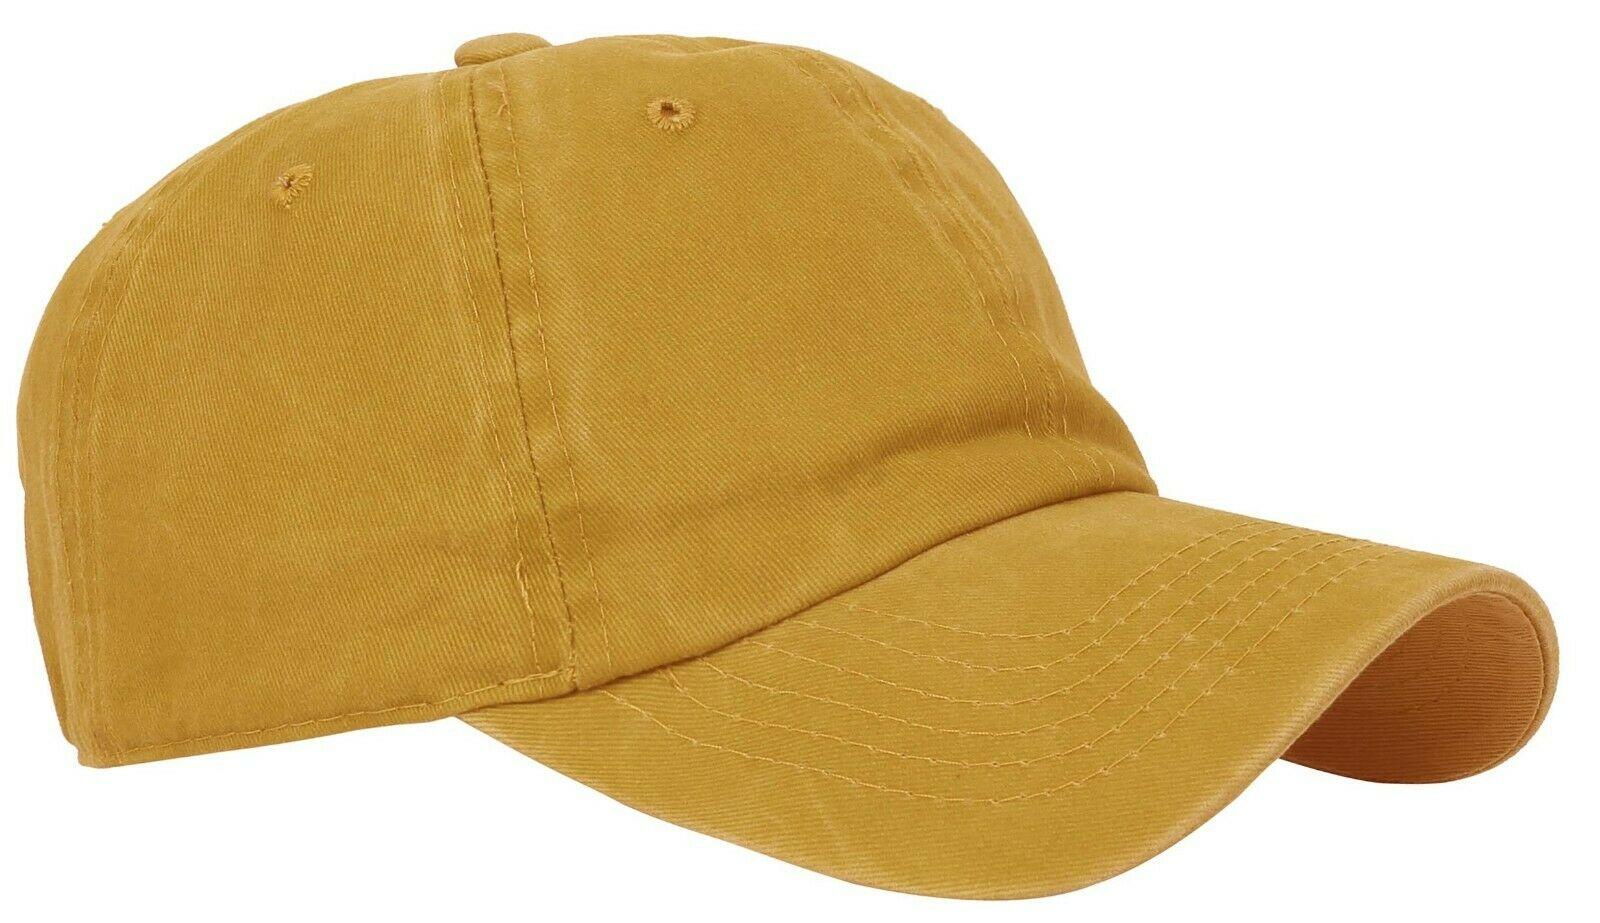 BASEBALL-CAP-Plain-Dad-Hat-Low-Profile-Vintage-Washed-Pigment-Adjustable thumbnail 23